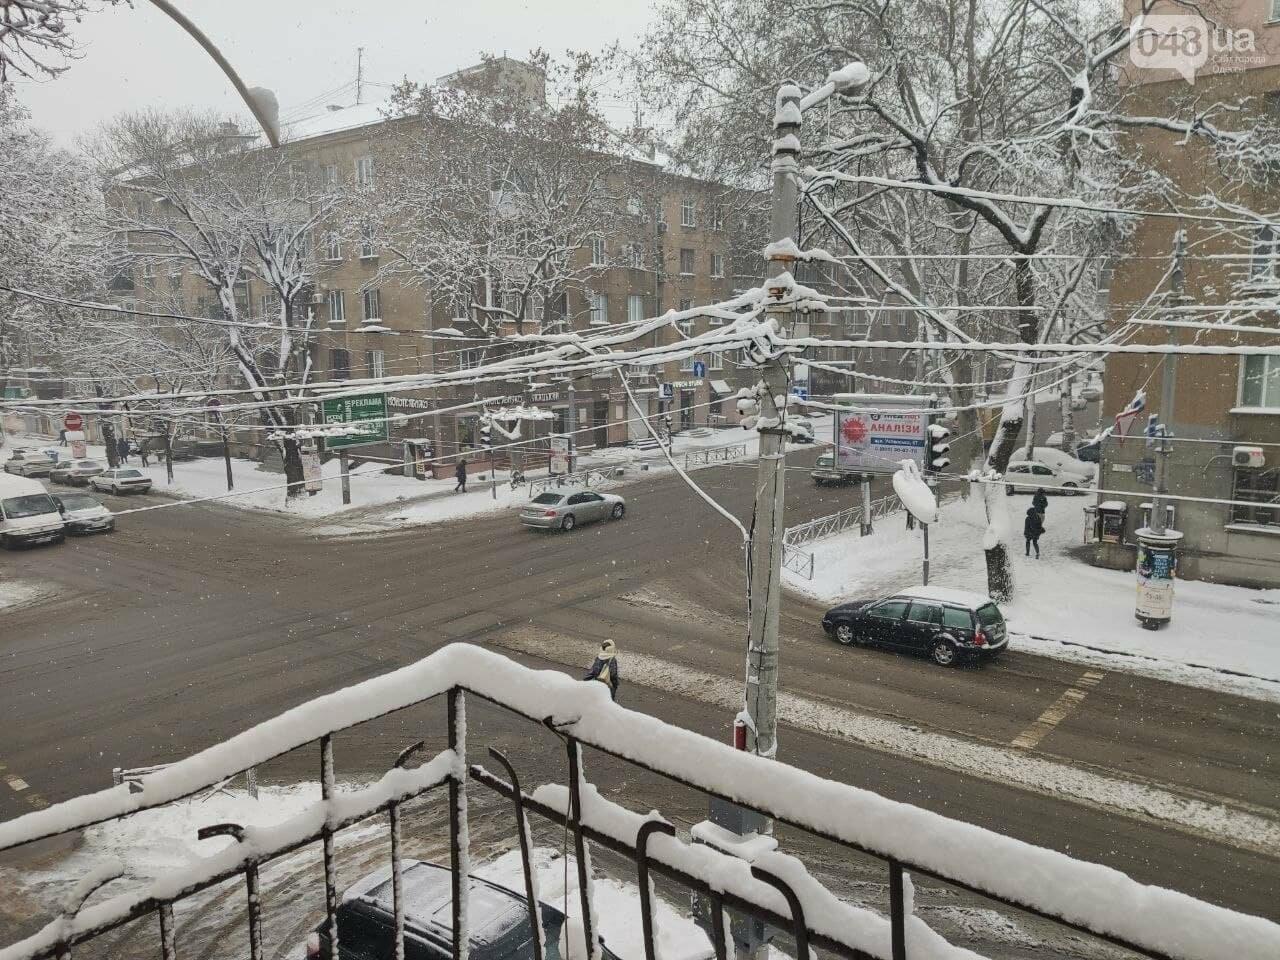 Одессу замело: ситуация на дорогах и тротуарах в городе, - ФОТО, фото-2